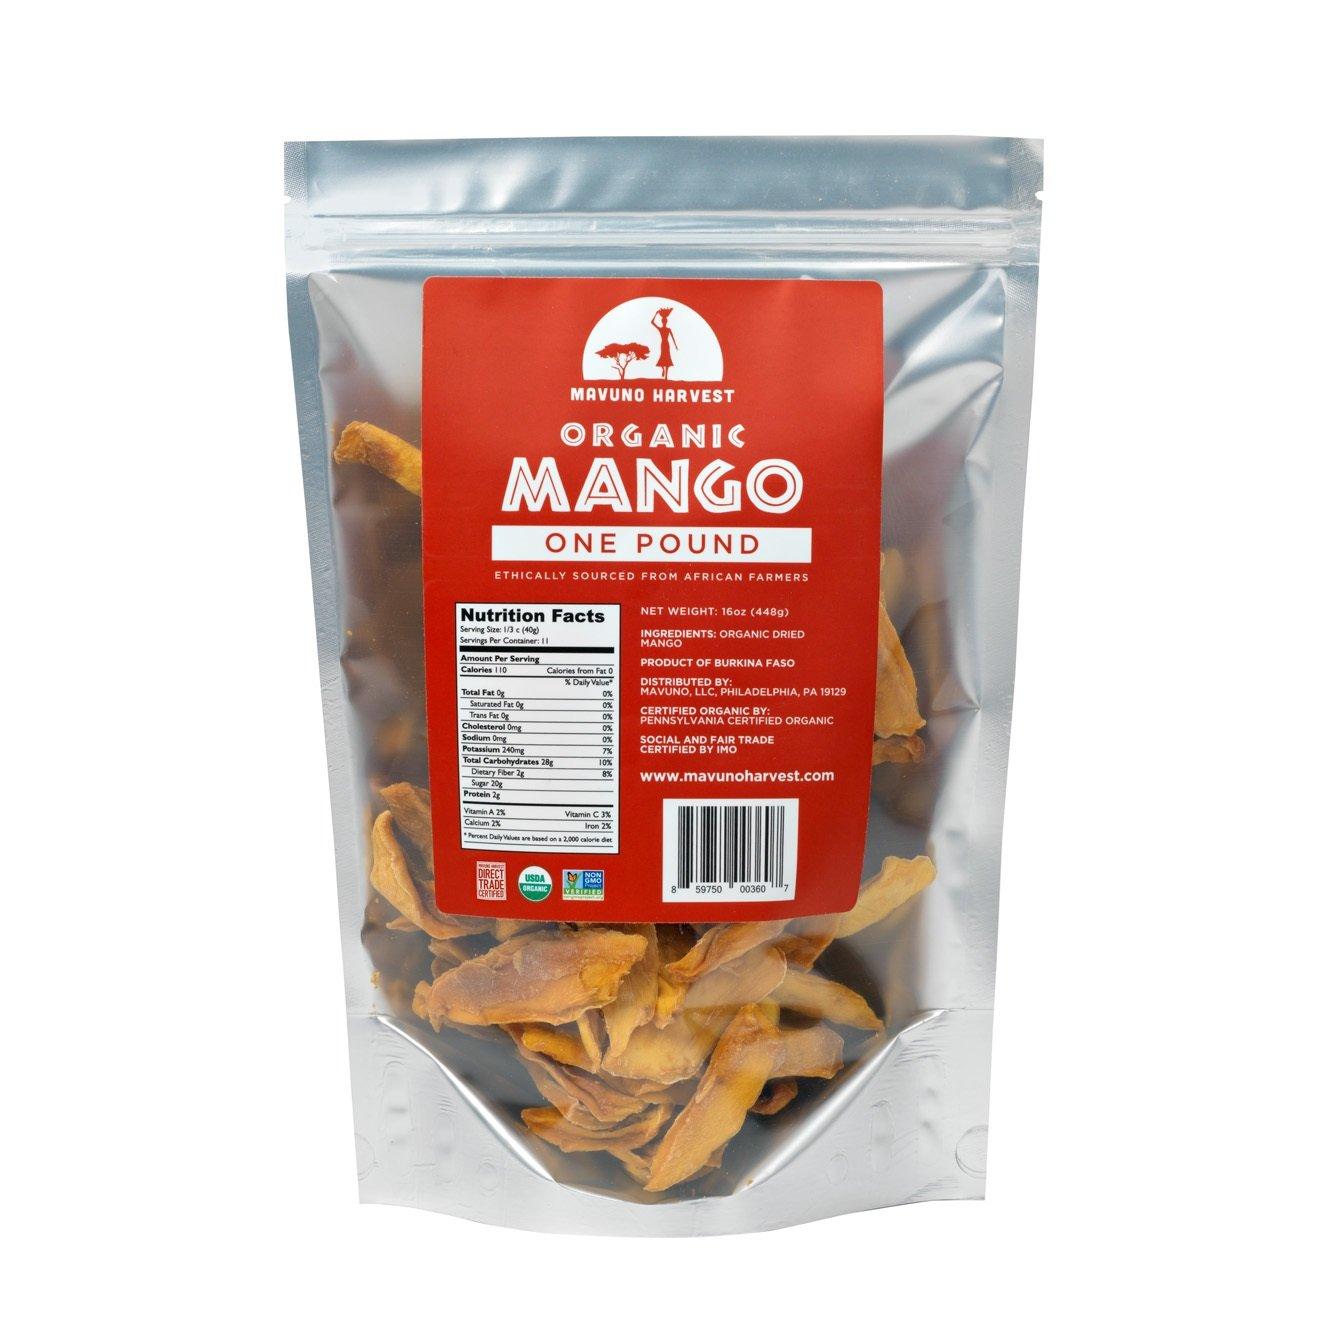 Mavuno Harvest Direct Trade Organic Dried Fruit, Mango, 1 Pound